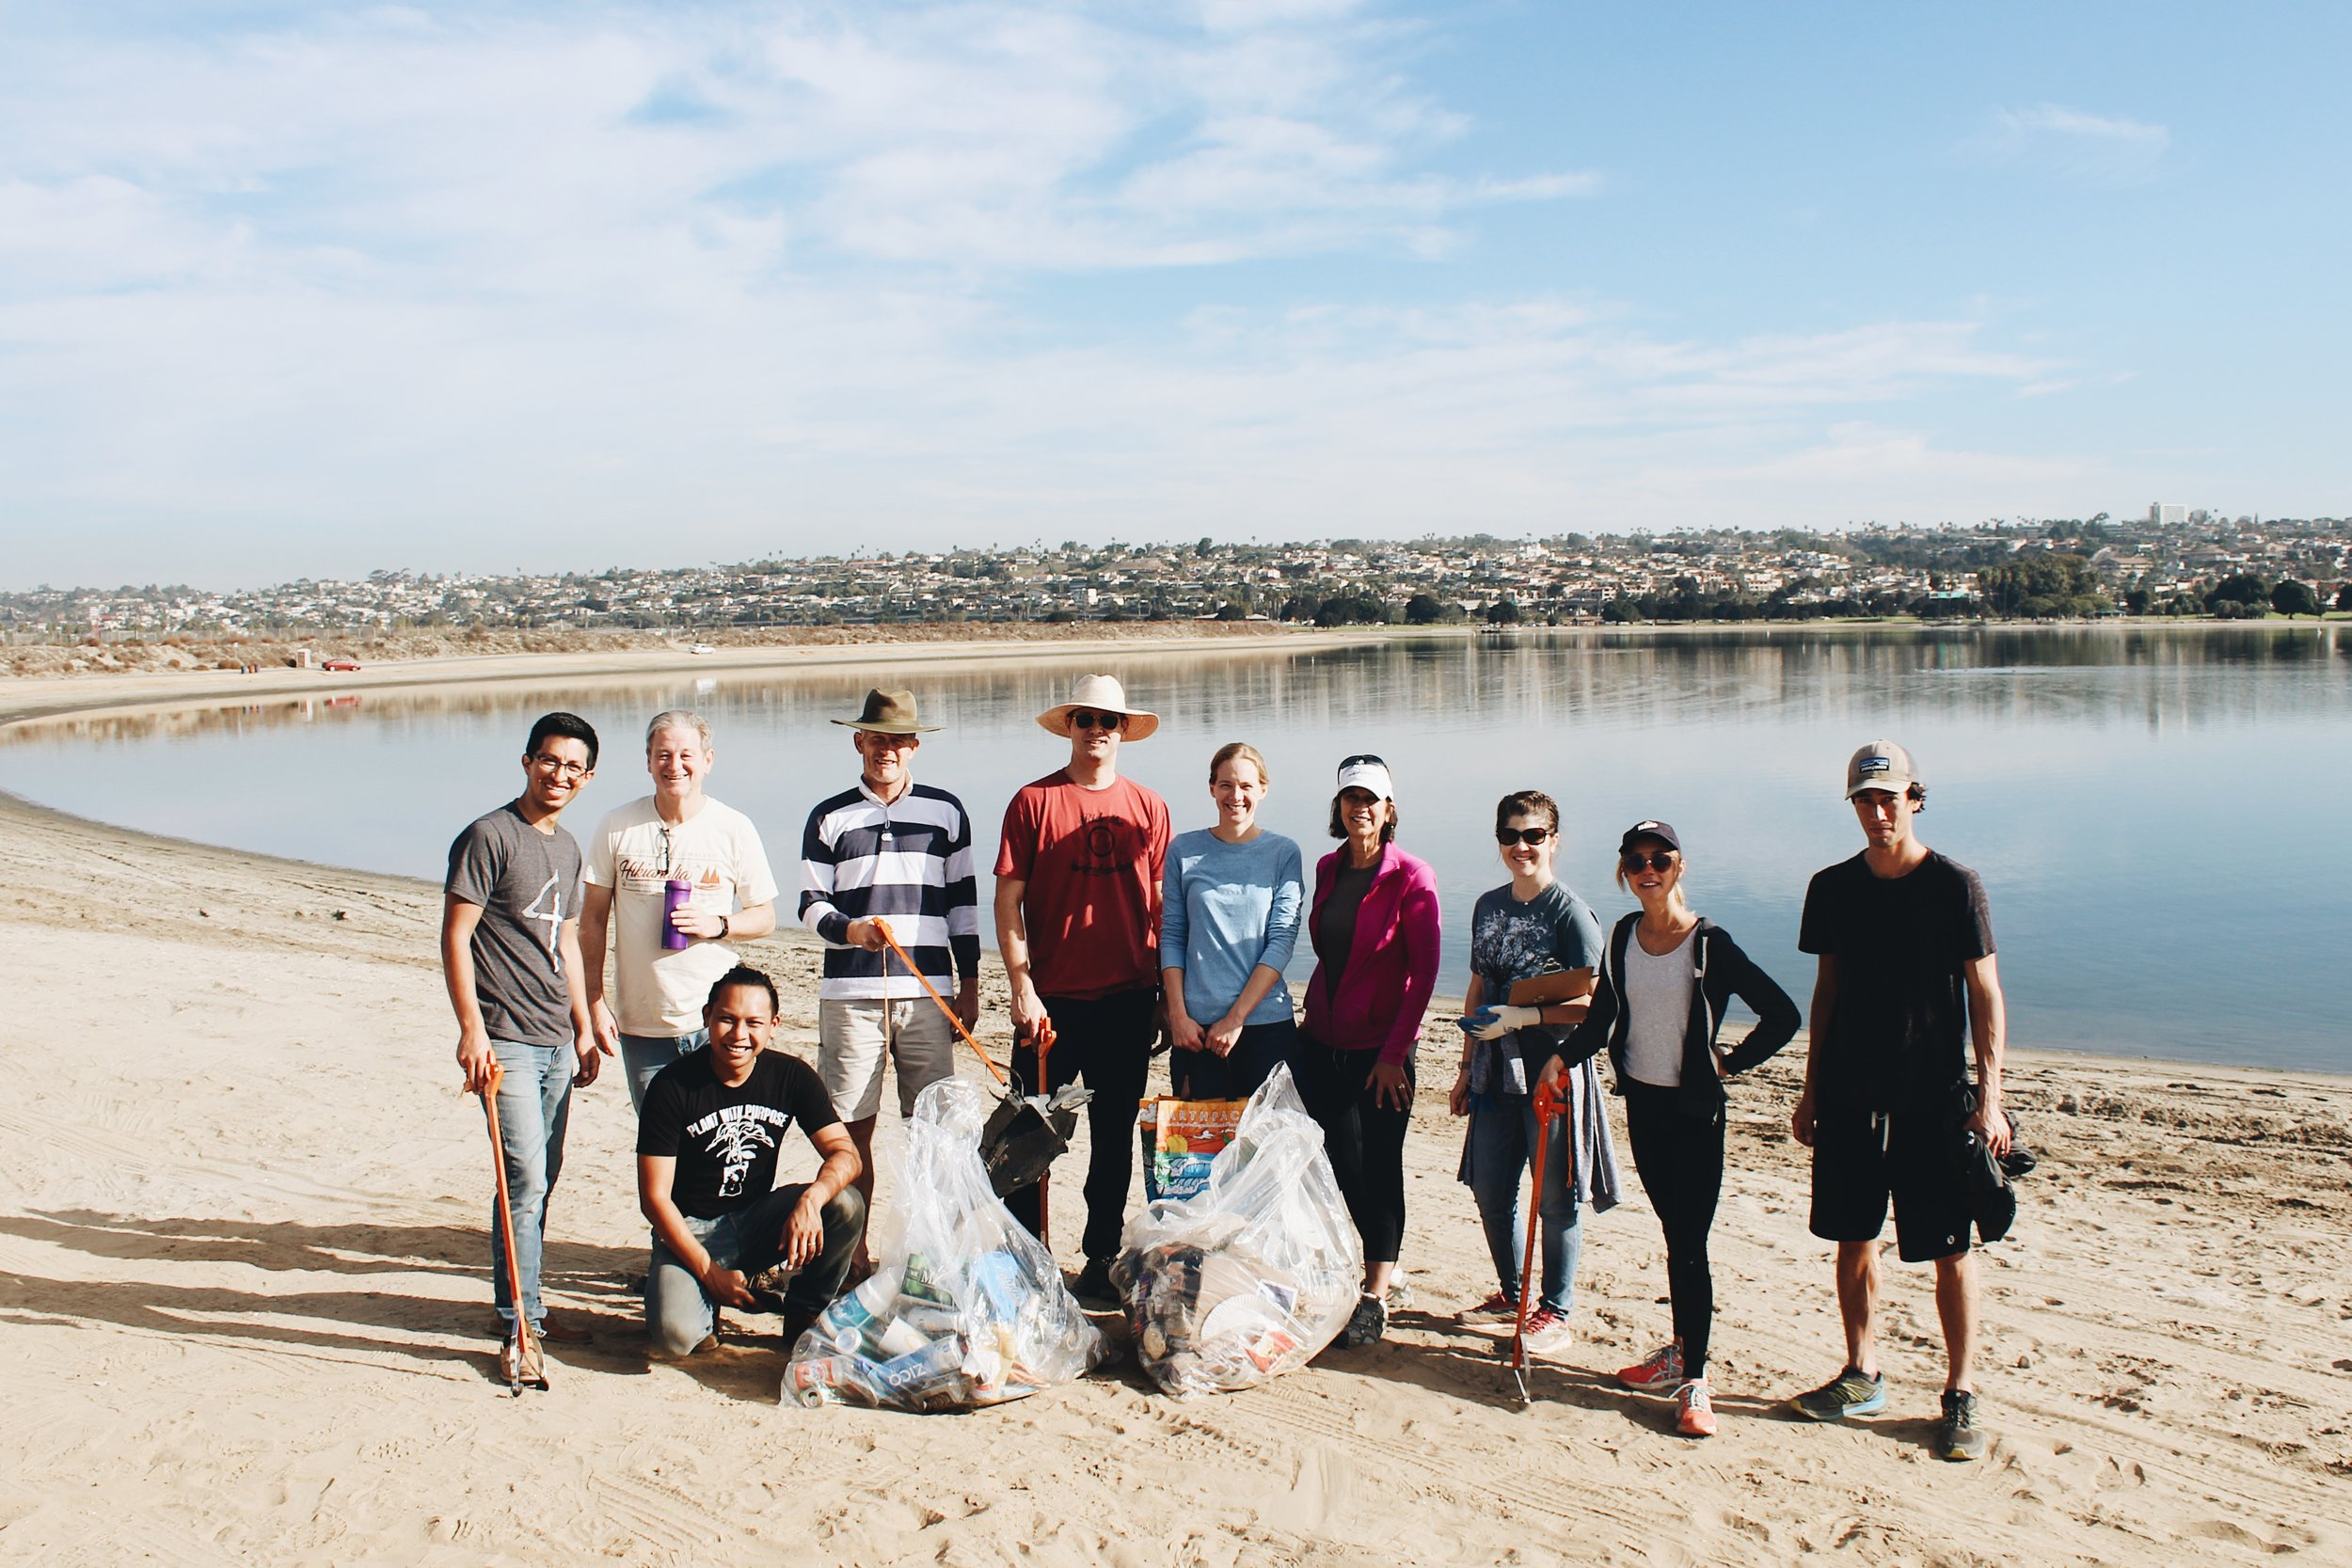 #320 Staff Beach Cleanup.JPG